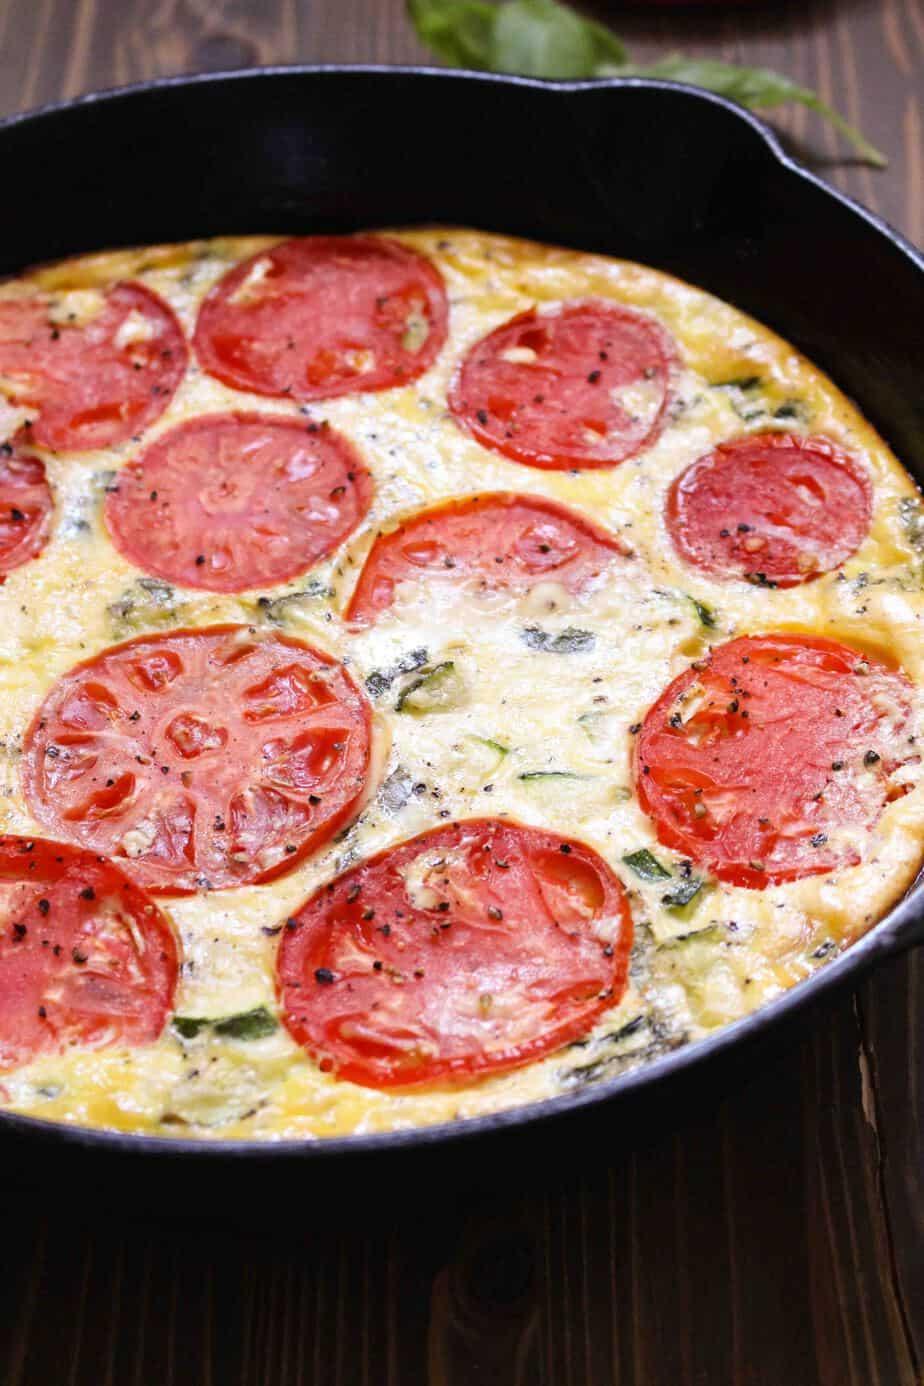 Easy Zucchini & Tomato Frittata with Feta | Frugal Nutrition